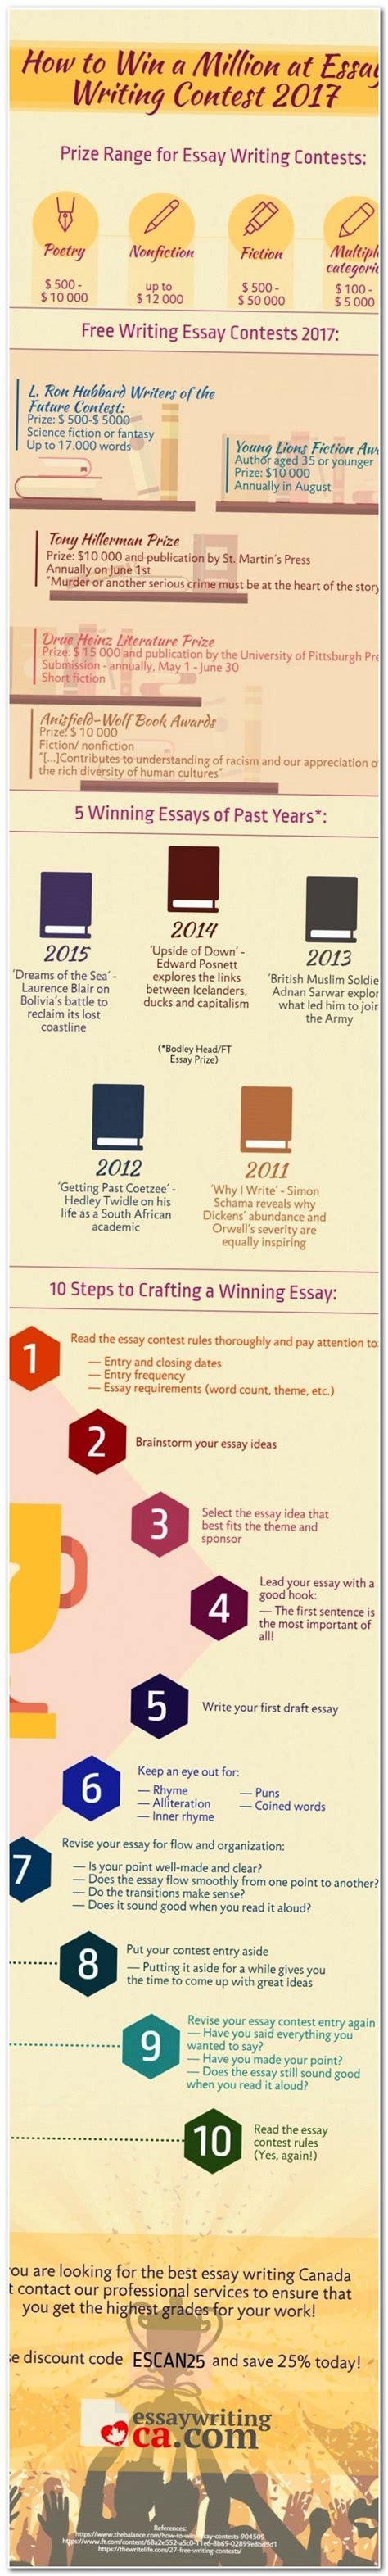 Mini Mba Program Wharton by Best 25 Essay Writing Help Ideas On Essay